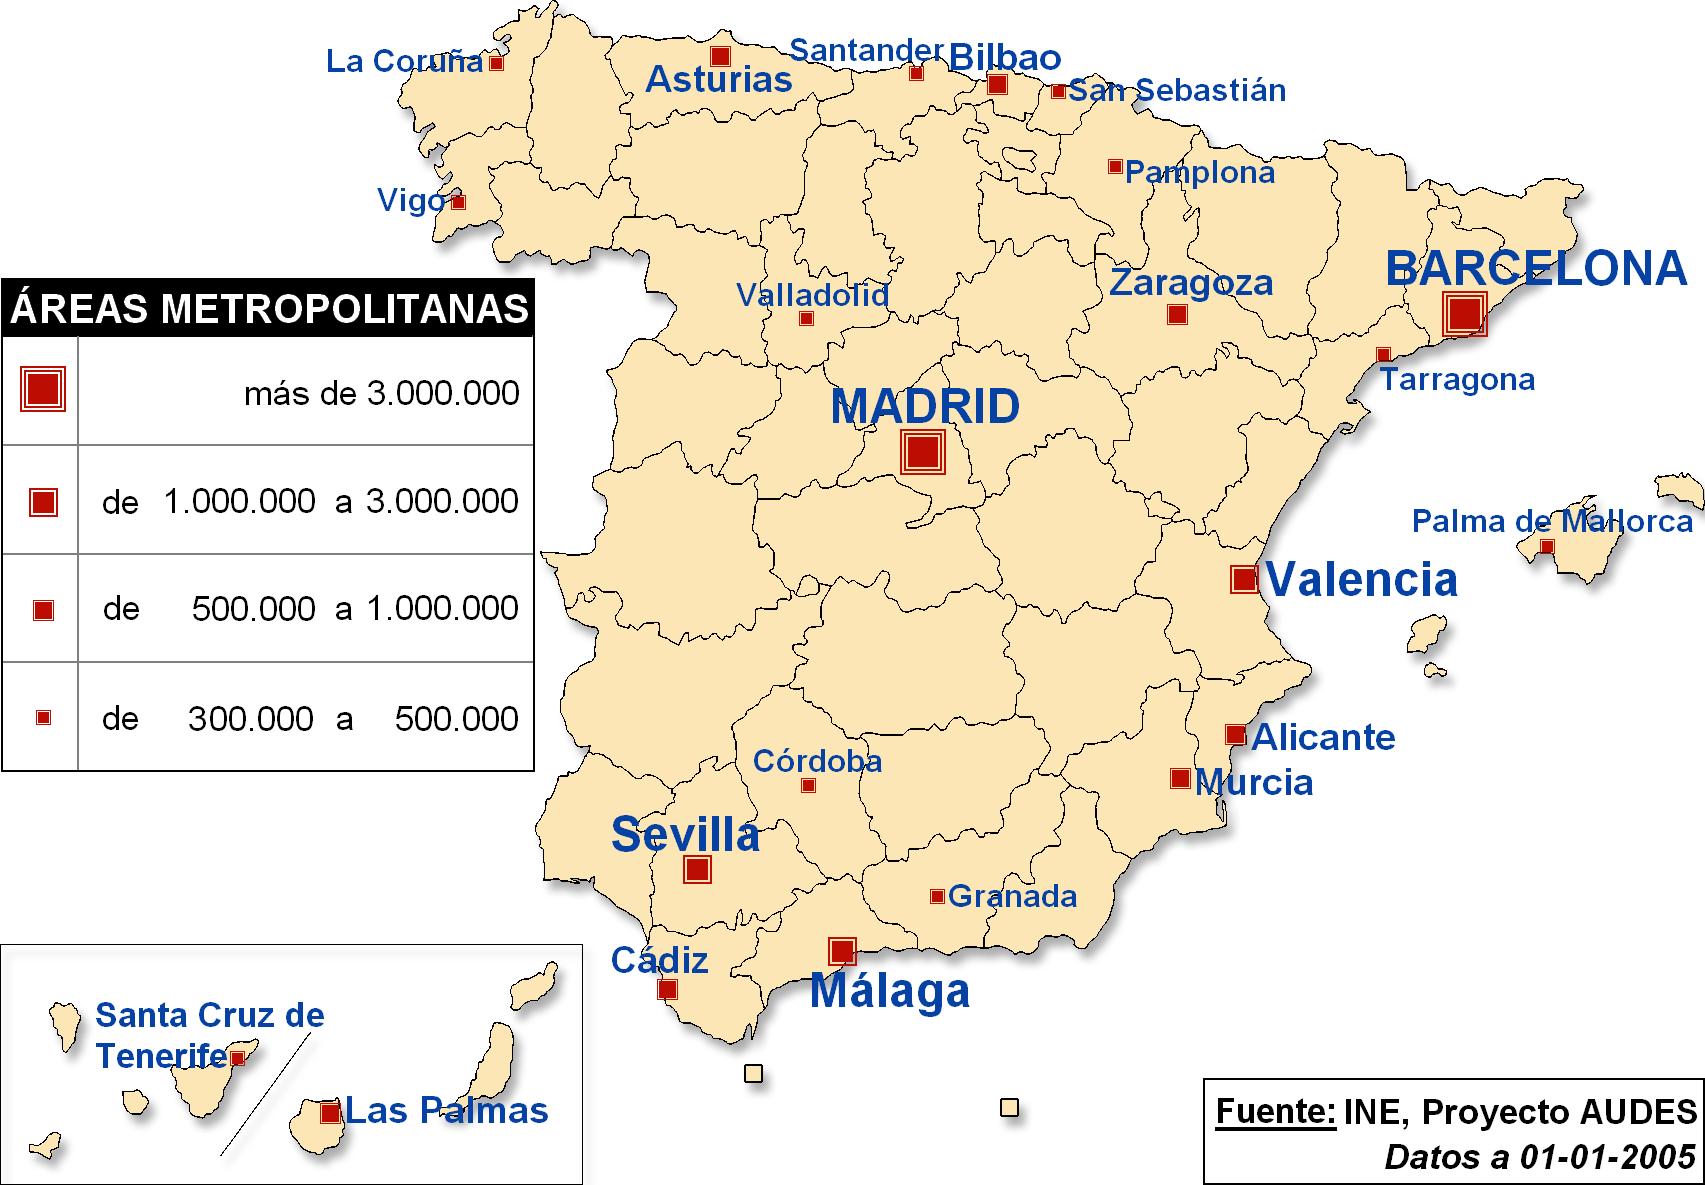 Principales reas metropolitanas de espa a 2005 tama o - Graficas madrid palma ...